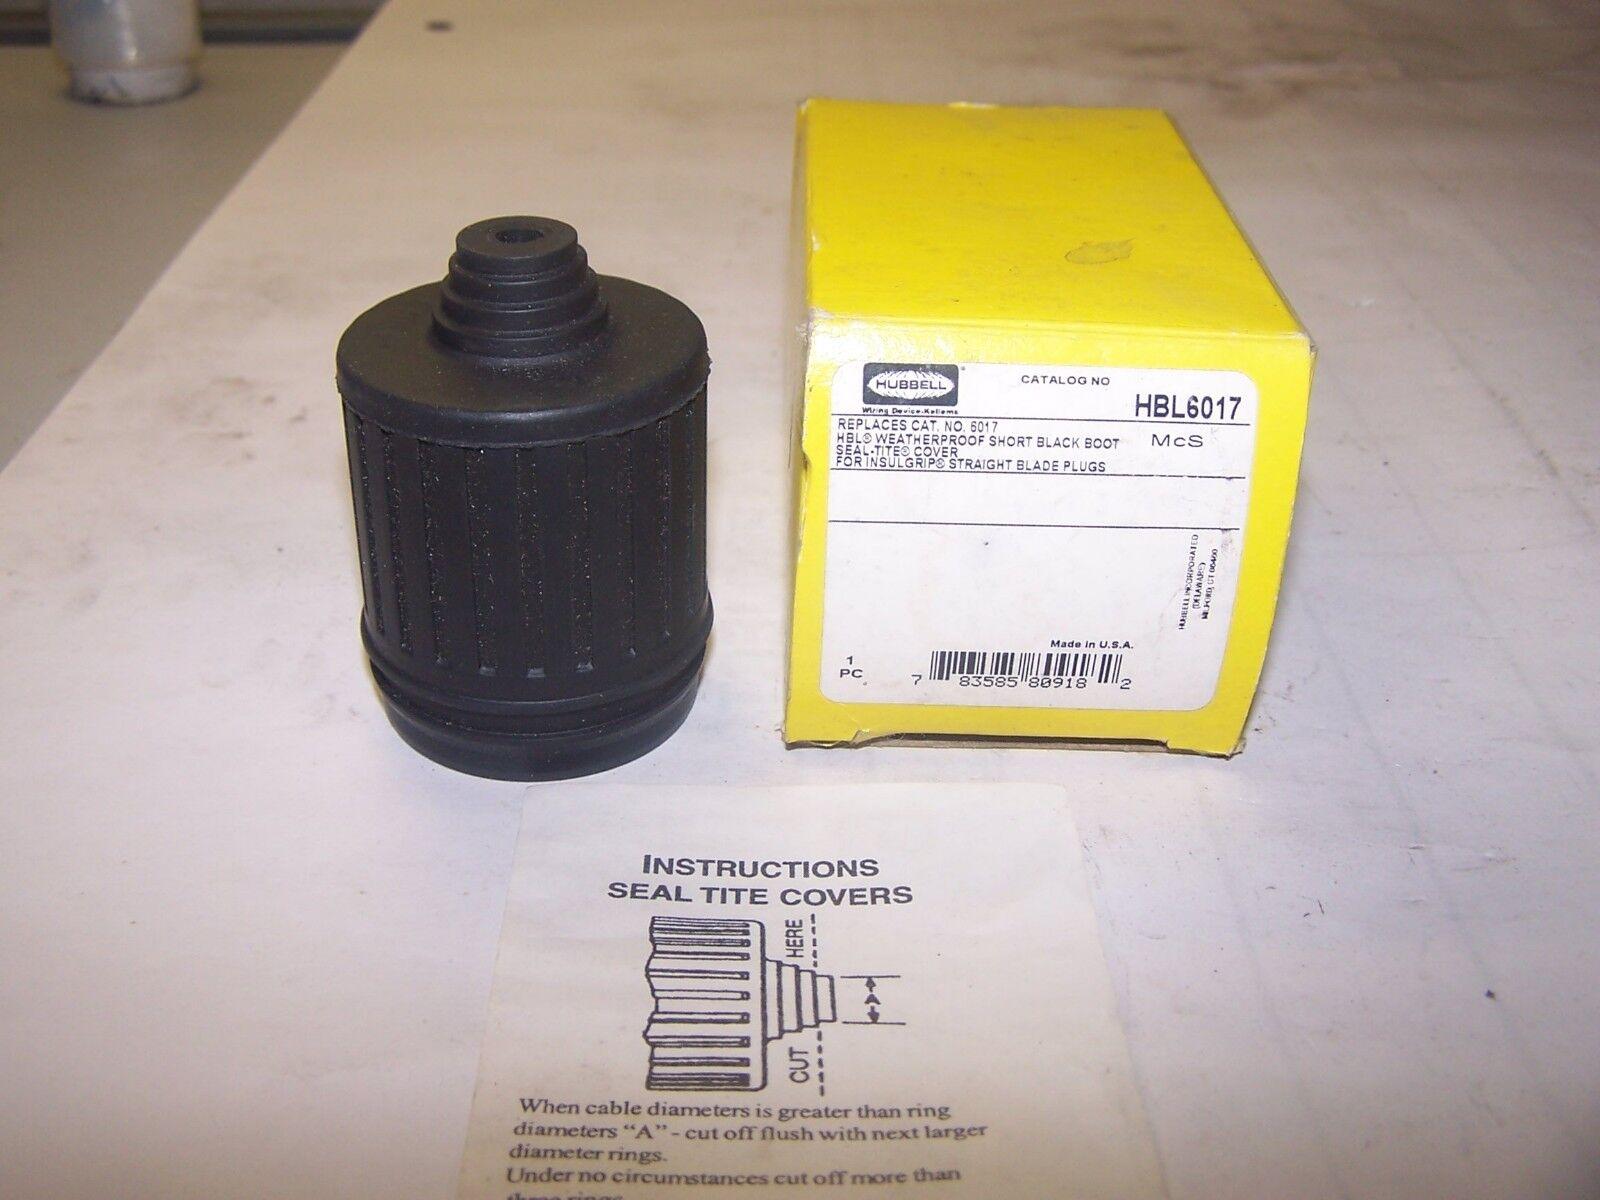 Hubbell HBL6027 Weatherproof Device Boot Black